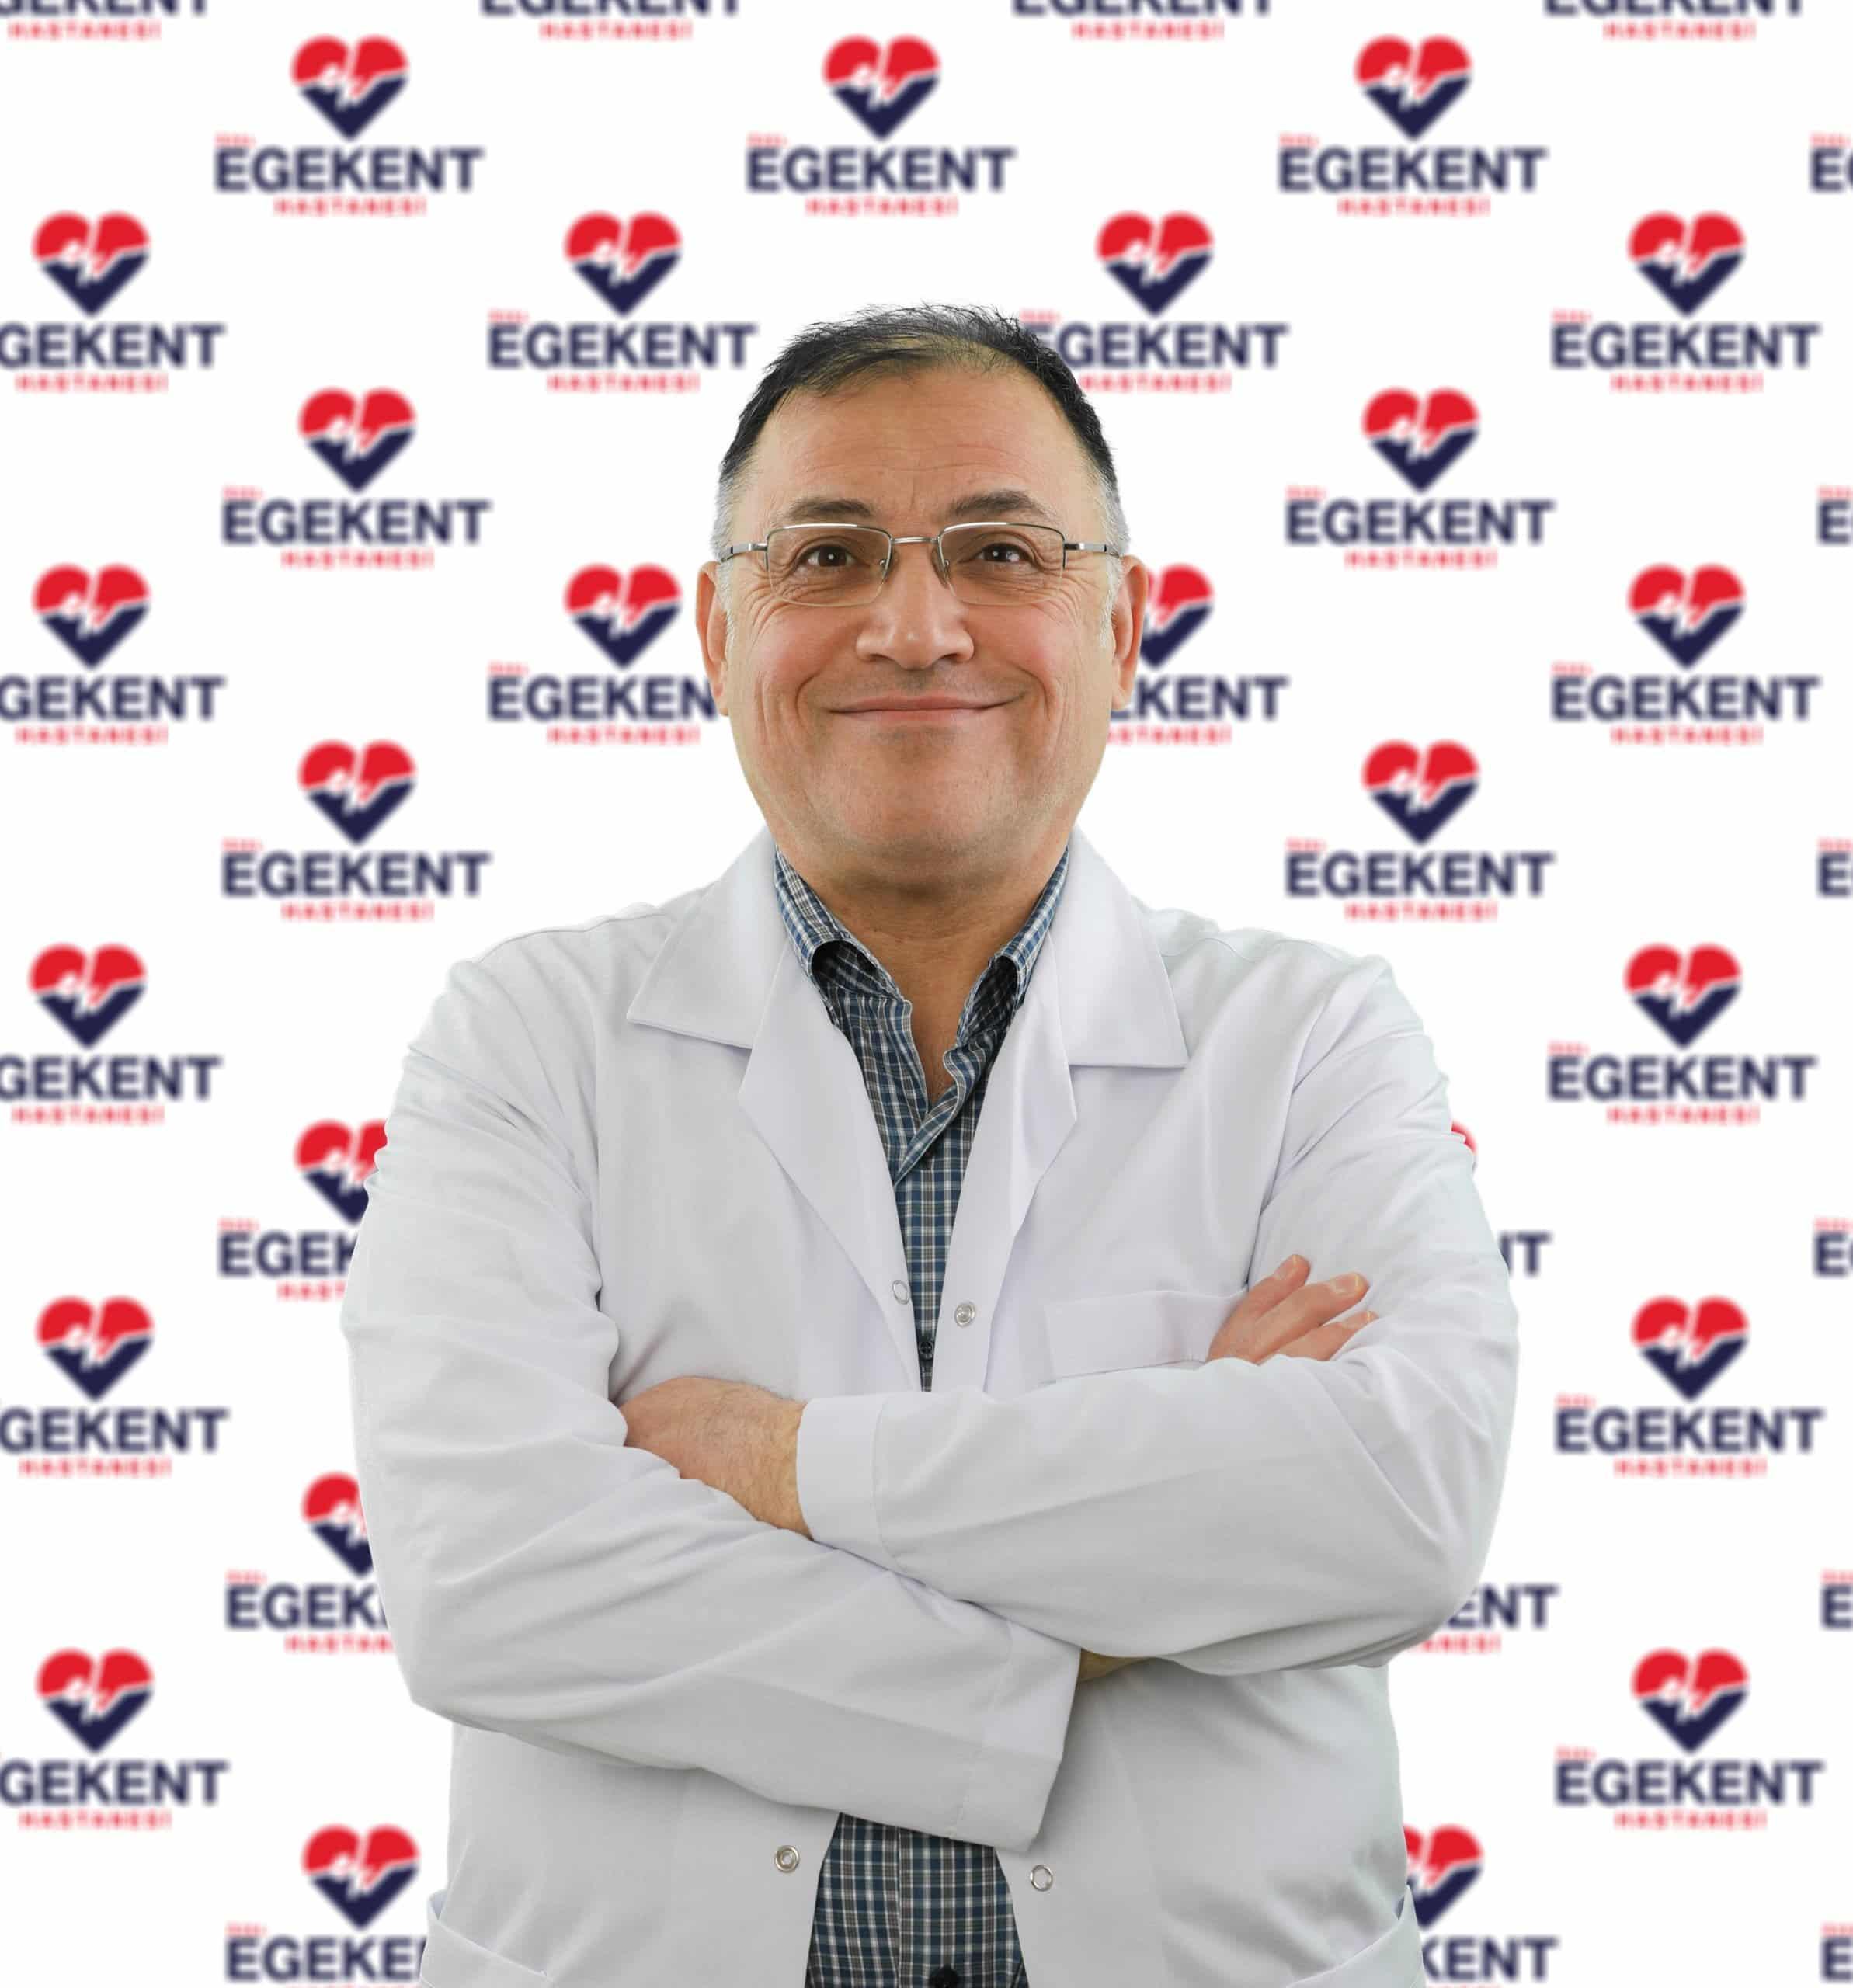 Denizli Özel Egekent Hastanesi Uzm. Dr. Ömür Atacan ATASOY